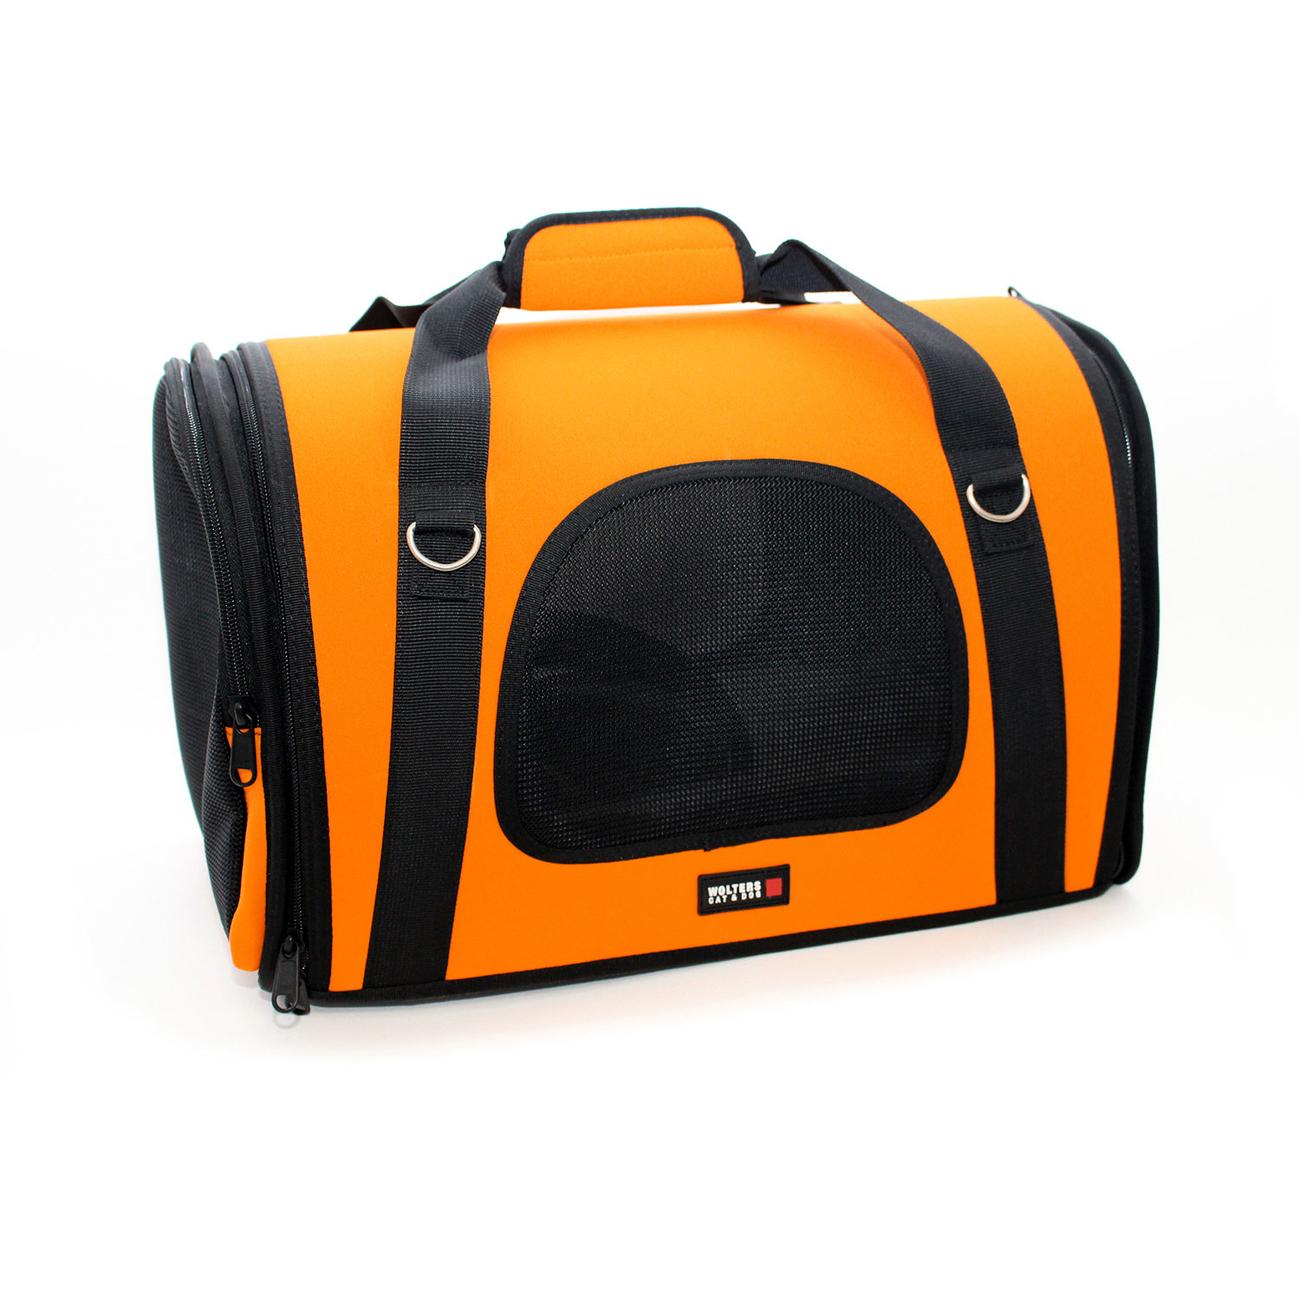 Wolters Transporttasche Sport-Carrier Neopren, Bild 14